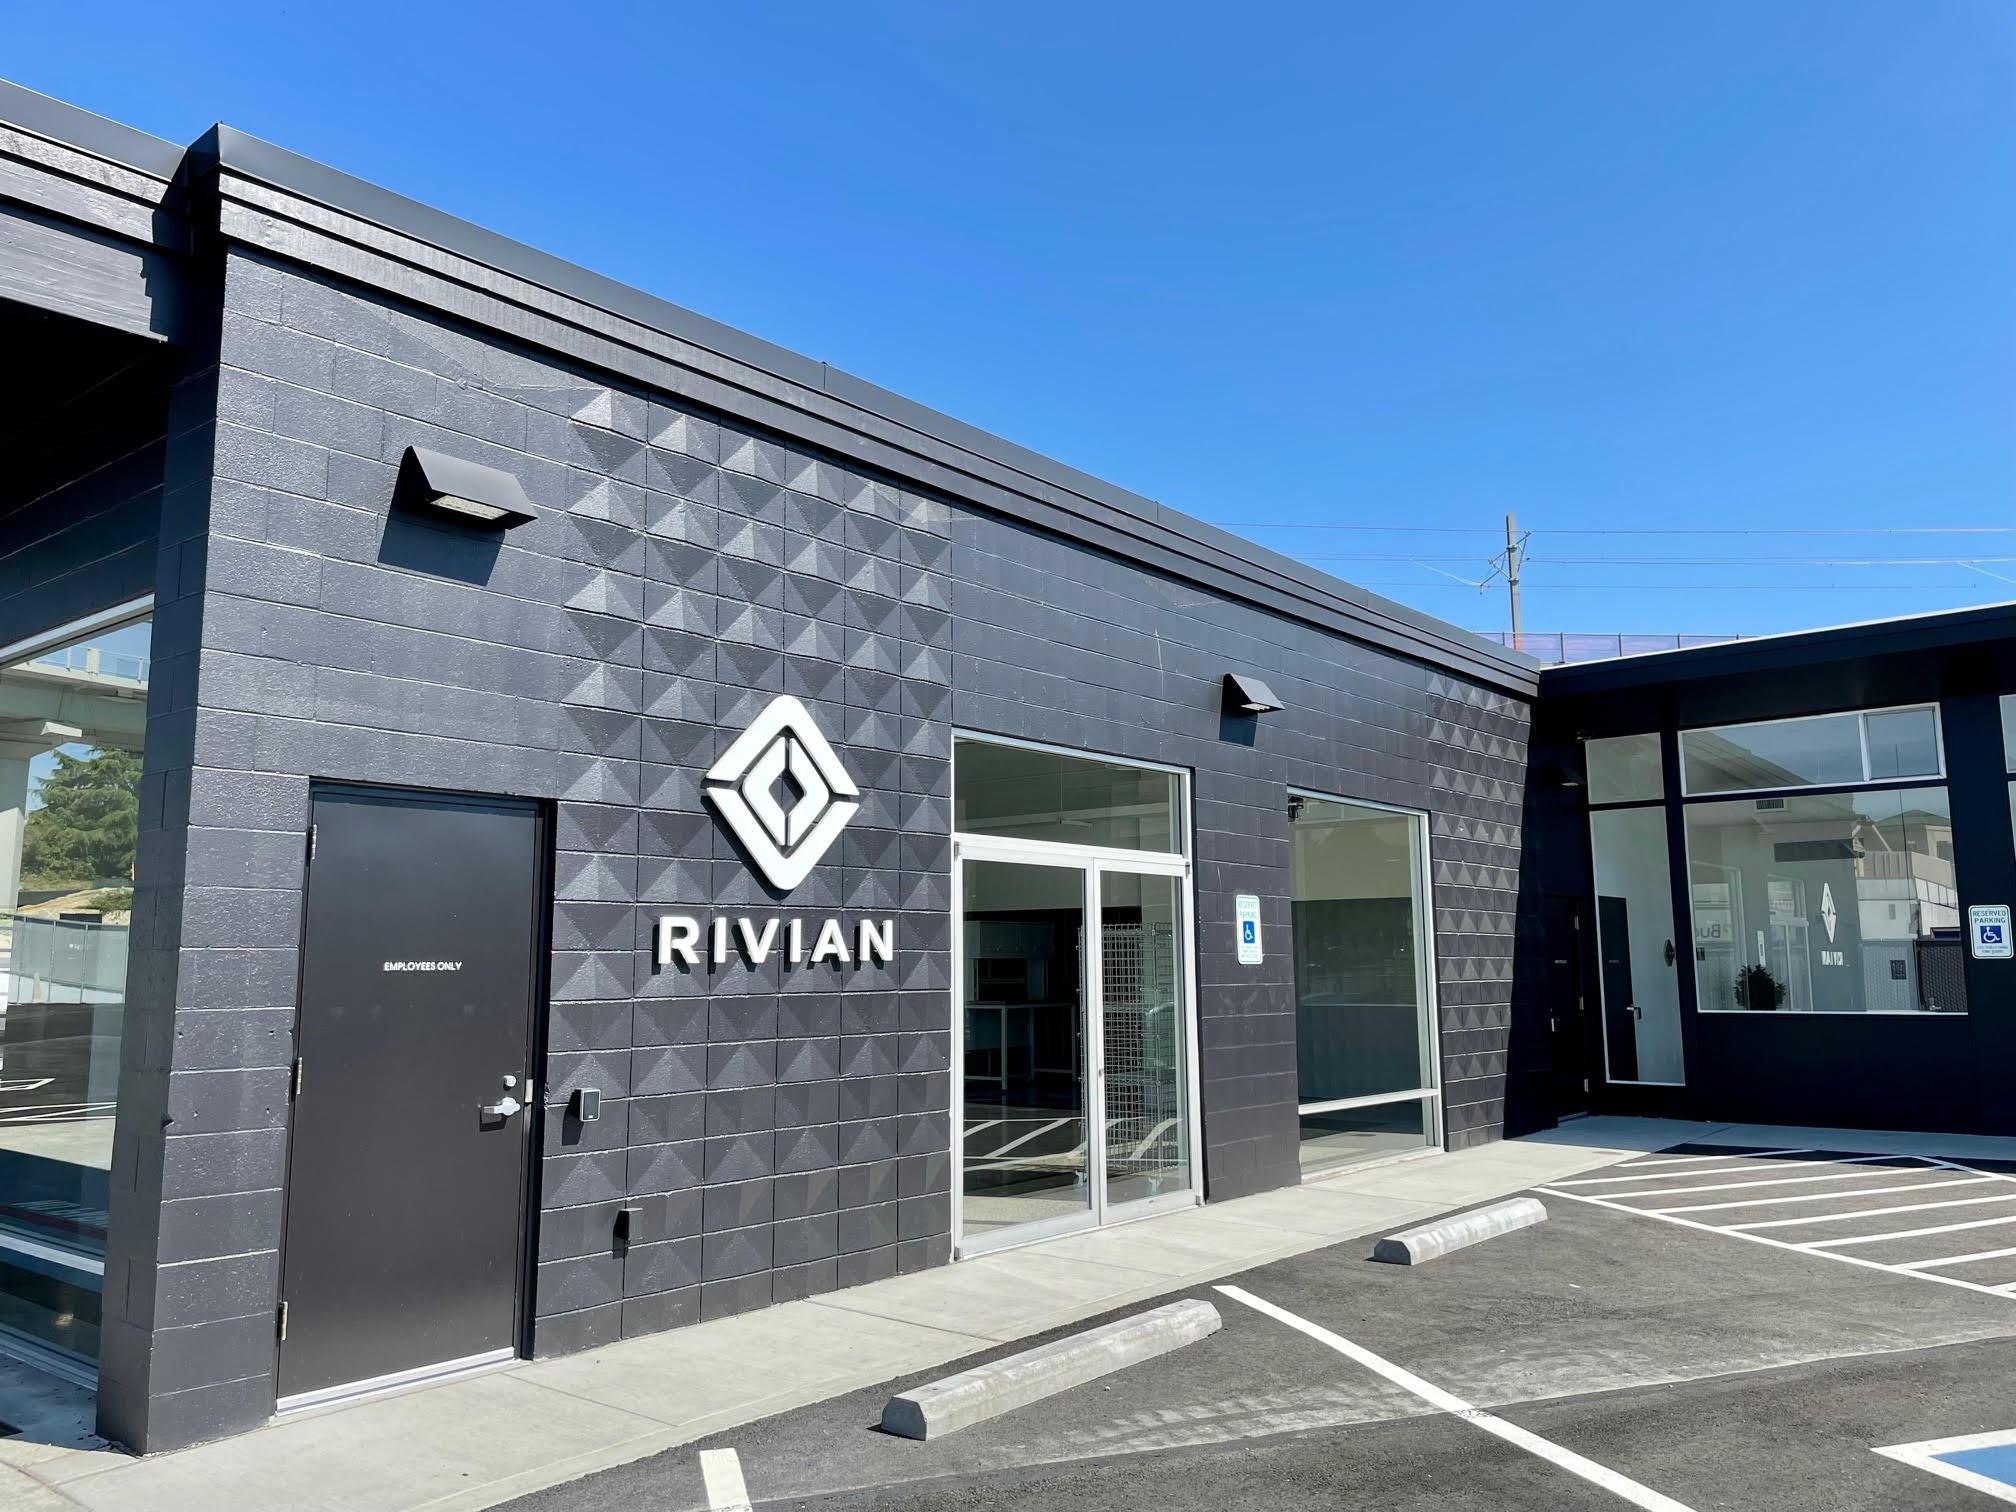 Rivian Electric Car Company 116th Ave NE in Bellevue